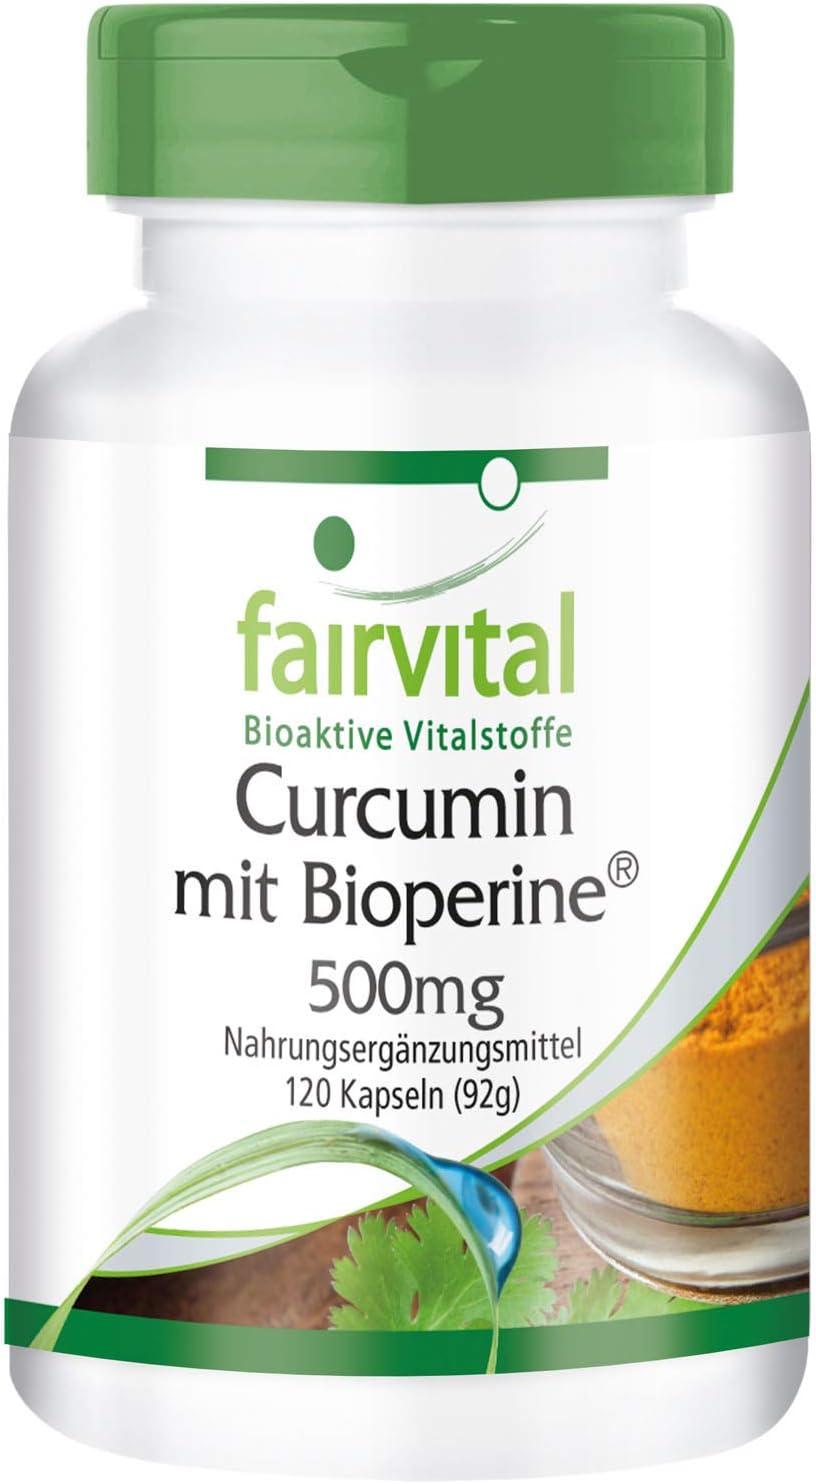 Curcumina + Piperina (Bioperine) 500mg - Extracto de Cúrcuma + Pimienta Negra - VEGANO - 95% de Curcuminoides - 120 Cápsulas - Calidad Alemana